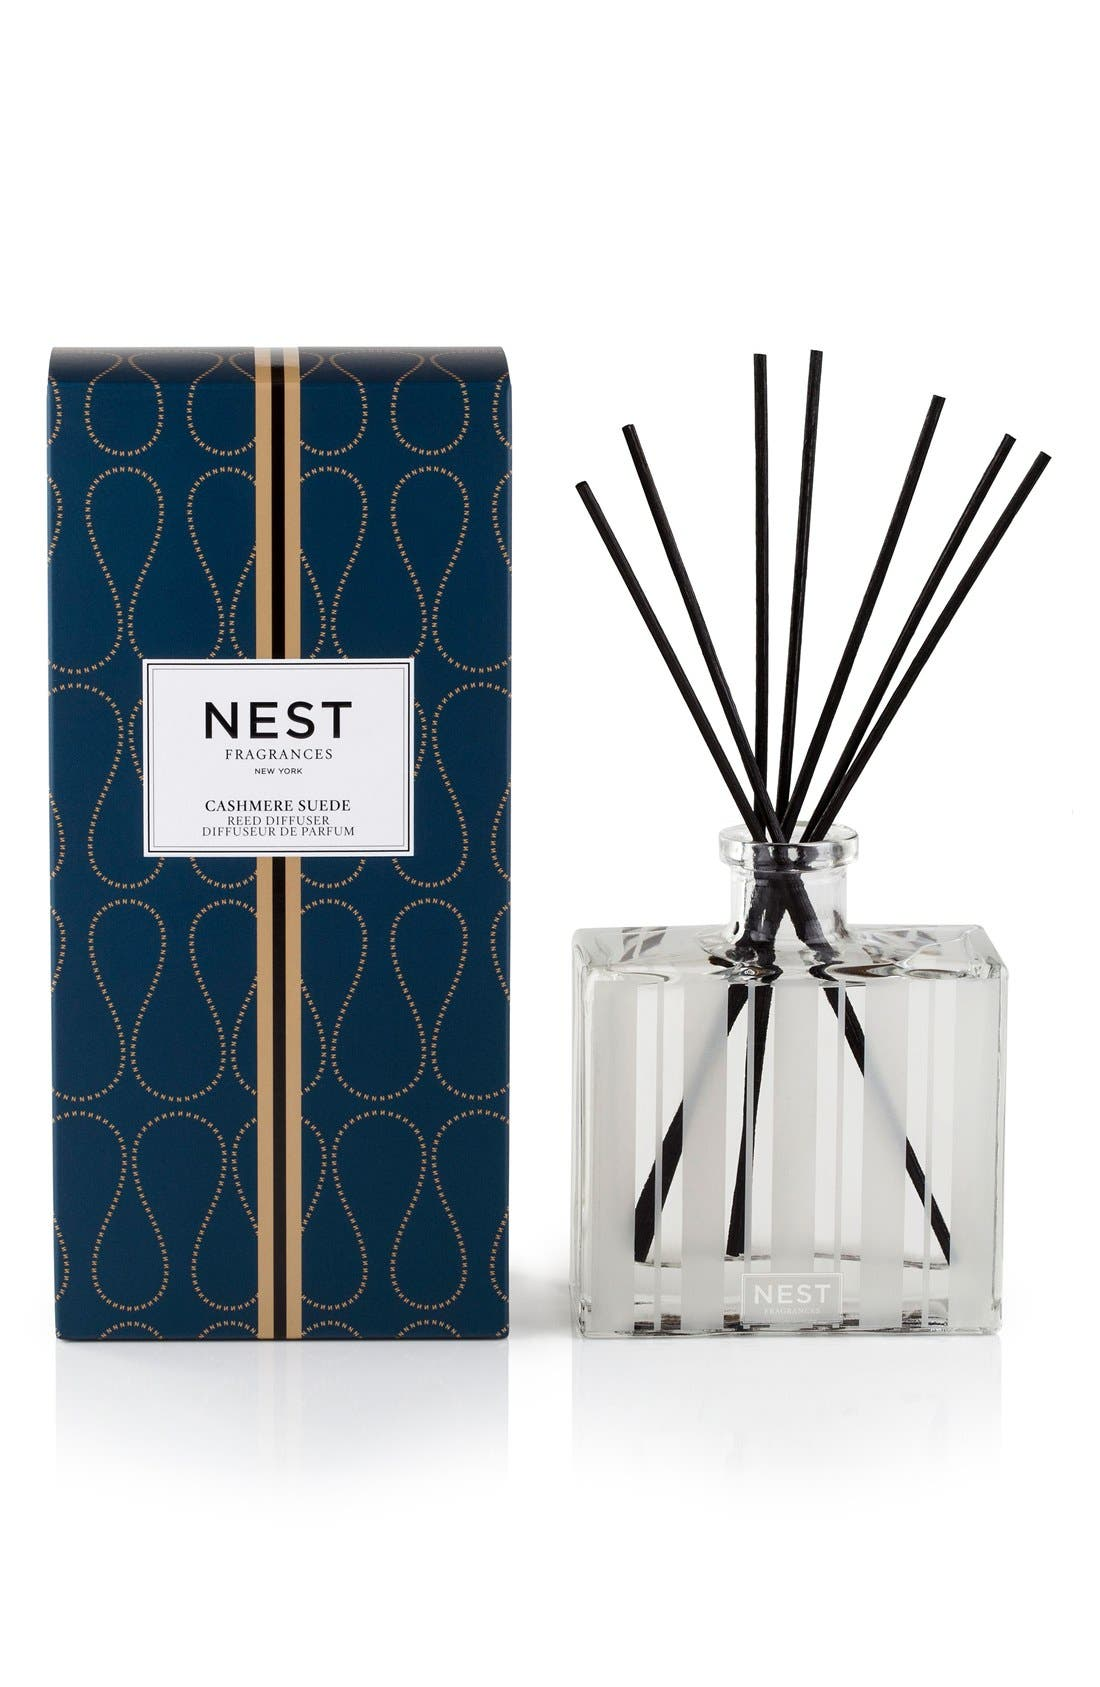 NEST Fragrances Cashmere Suede Reed Diffuser